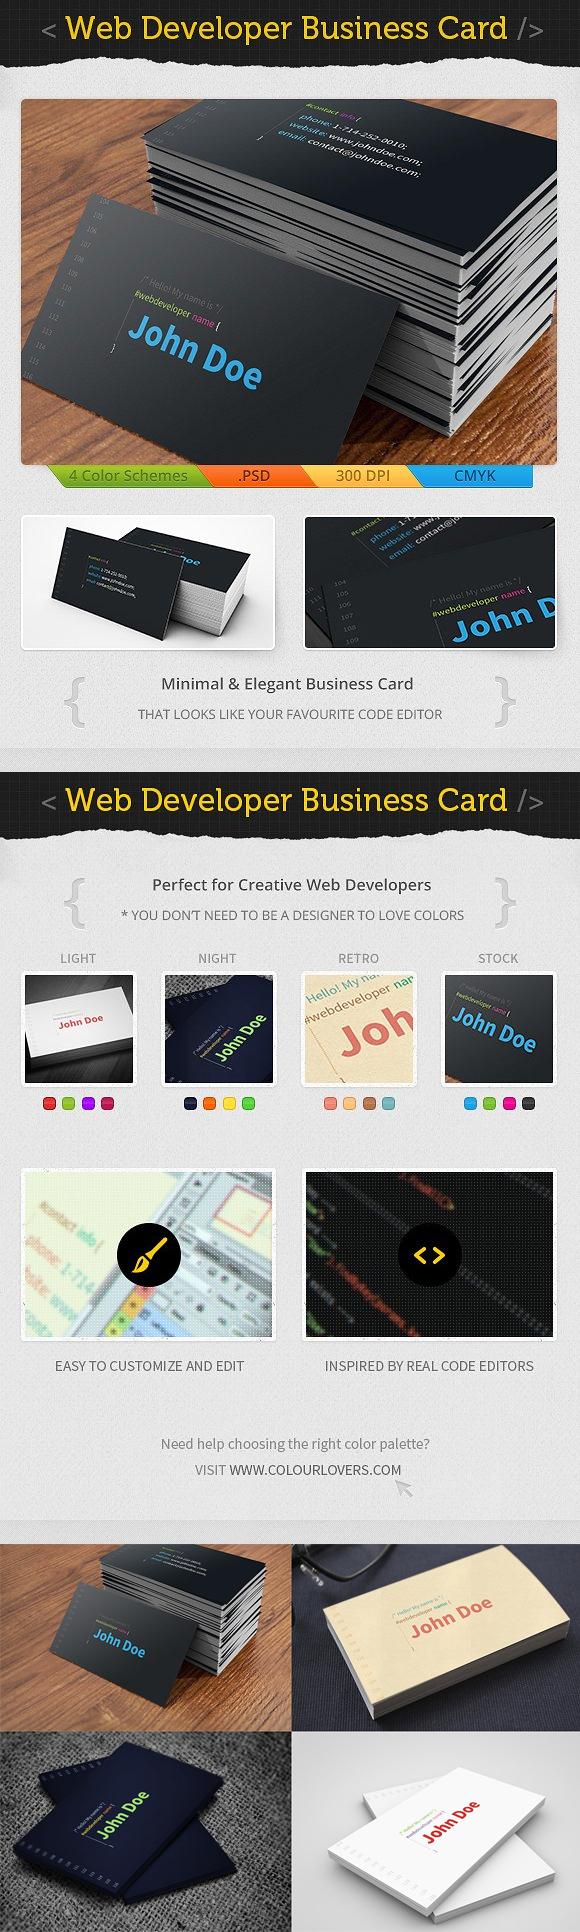 Web developer business card templates psd business card template web developer business card templates psd magicingreecefo Choice Image